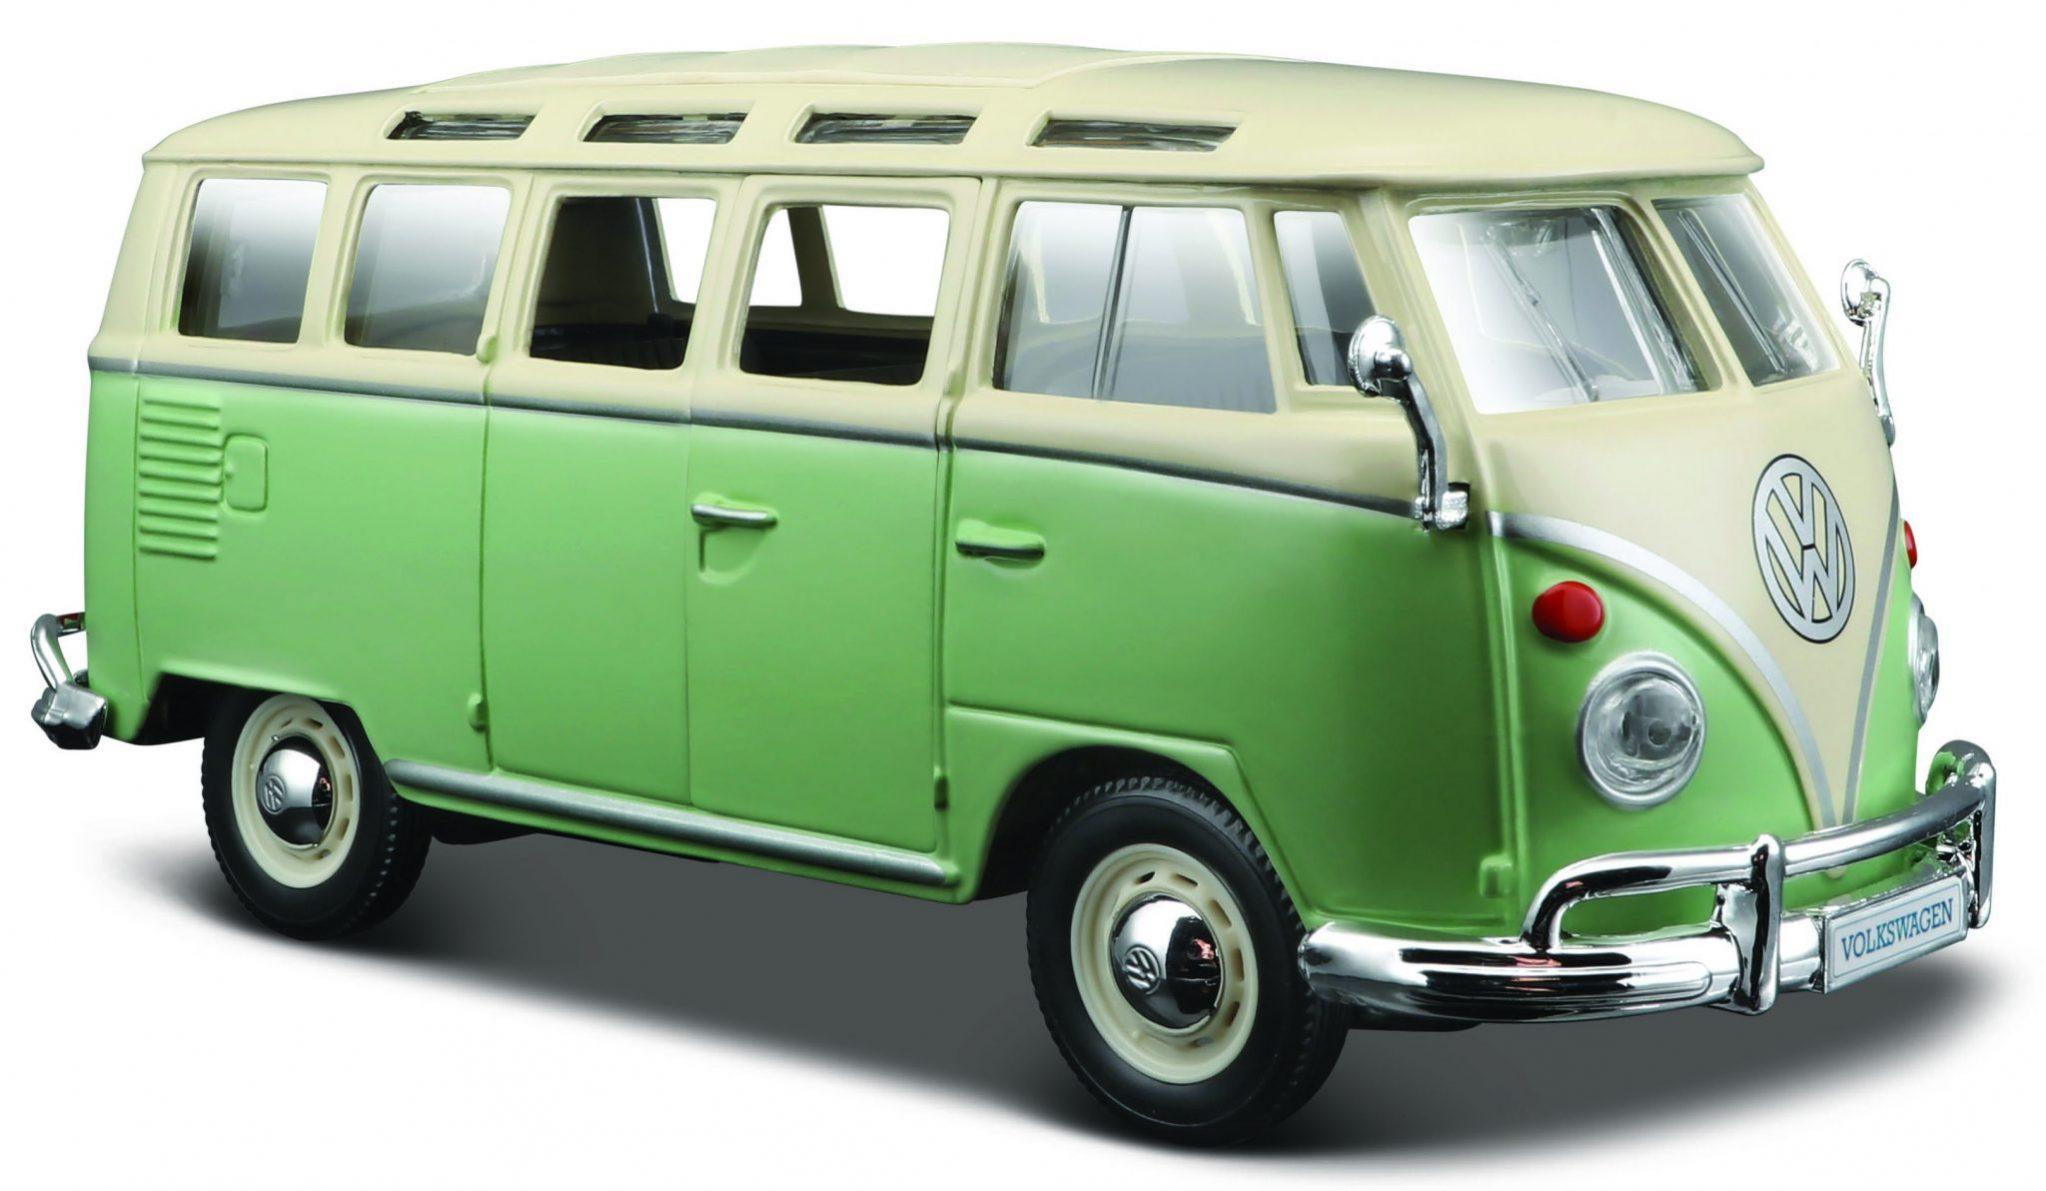 31956G VW T1 samba van 1 op 24